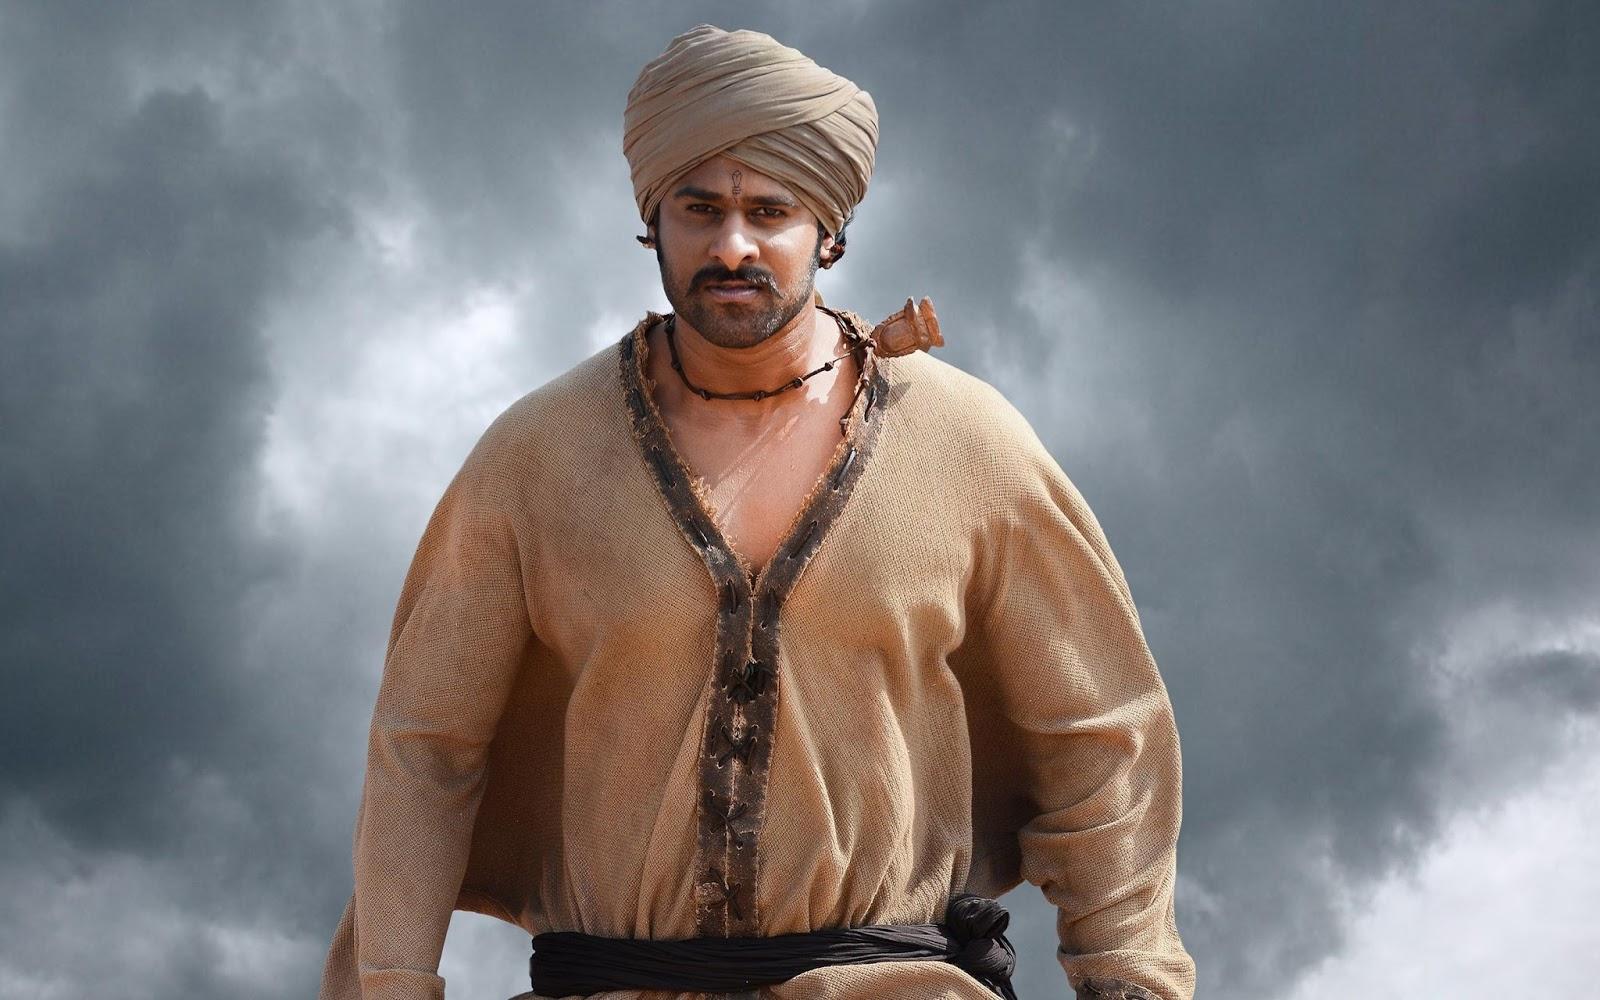 Best Actor Prabhas Hd Wallpaper: 51 Top Hd Wallpaper: Bahubali 2 HD Wallpapers Free Download